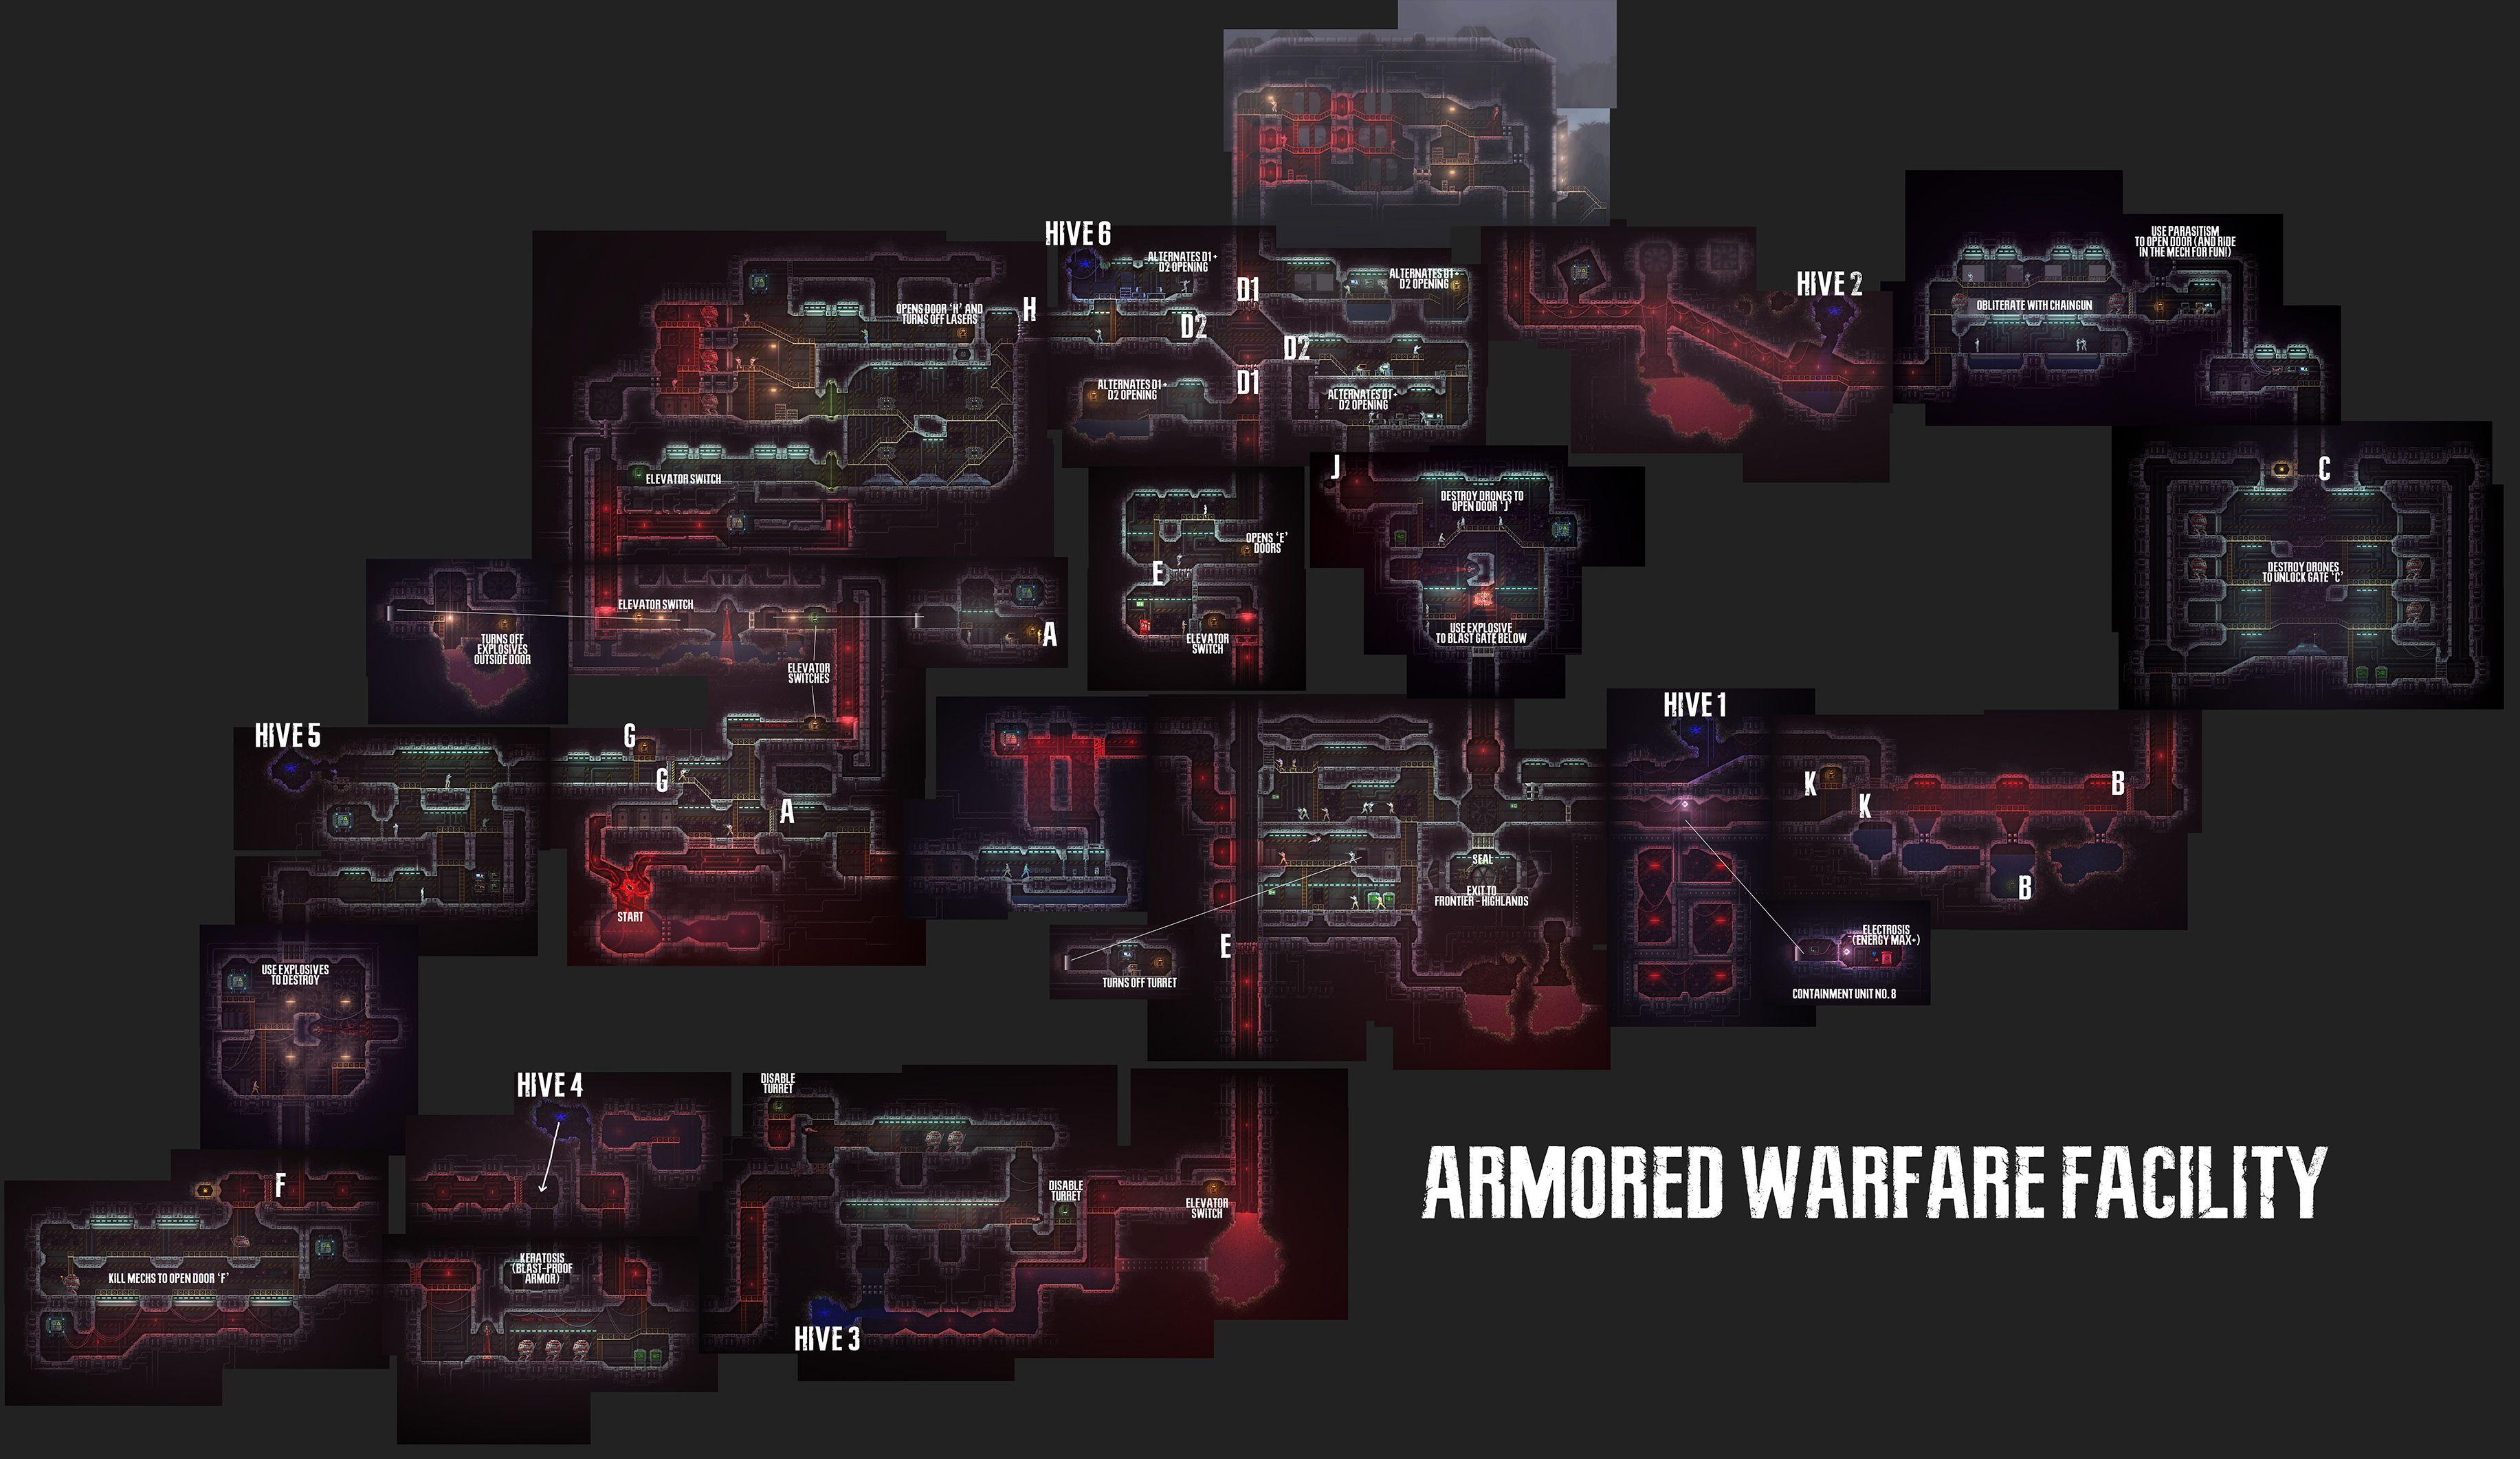 Armored Warfare Facility